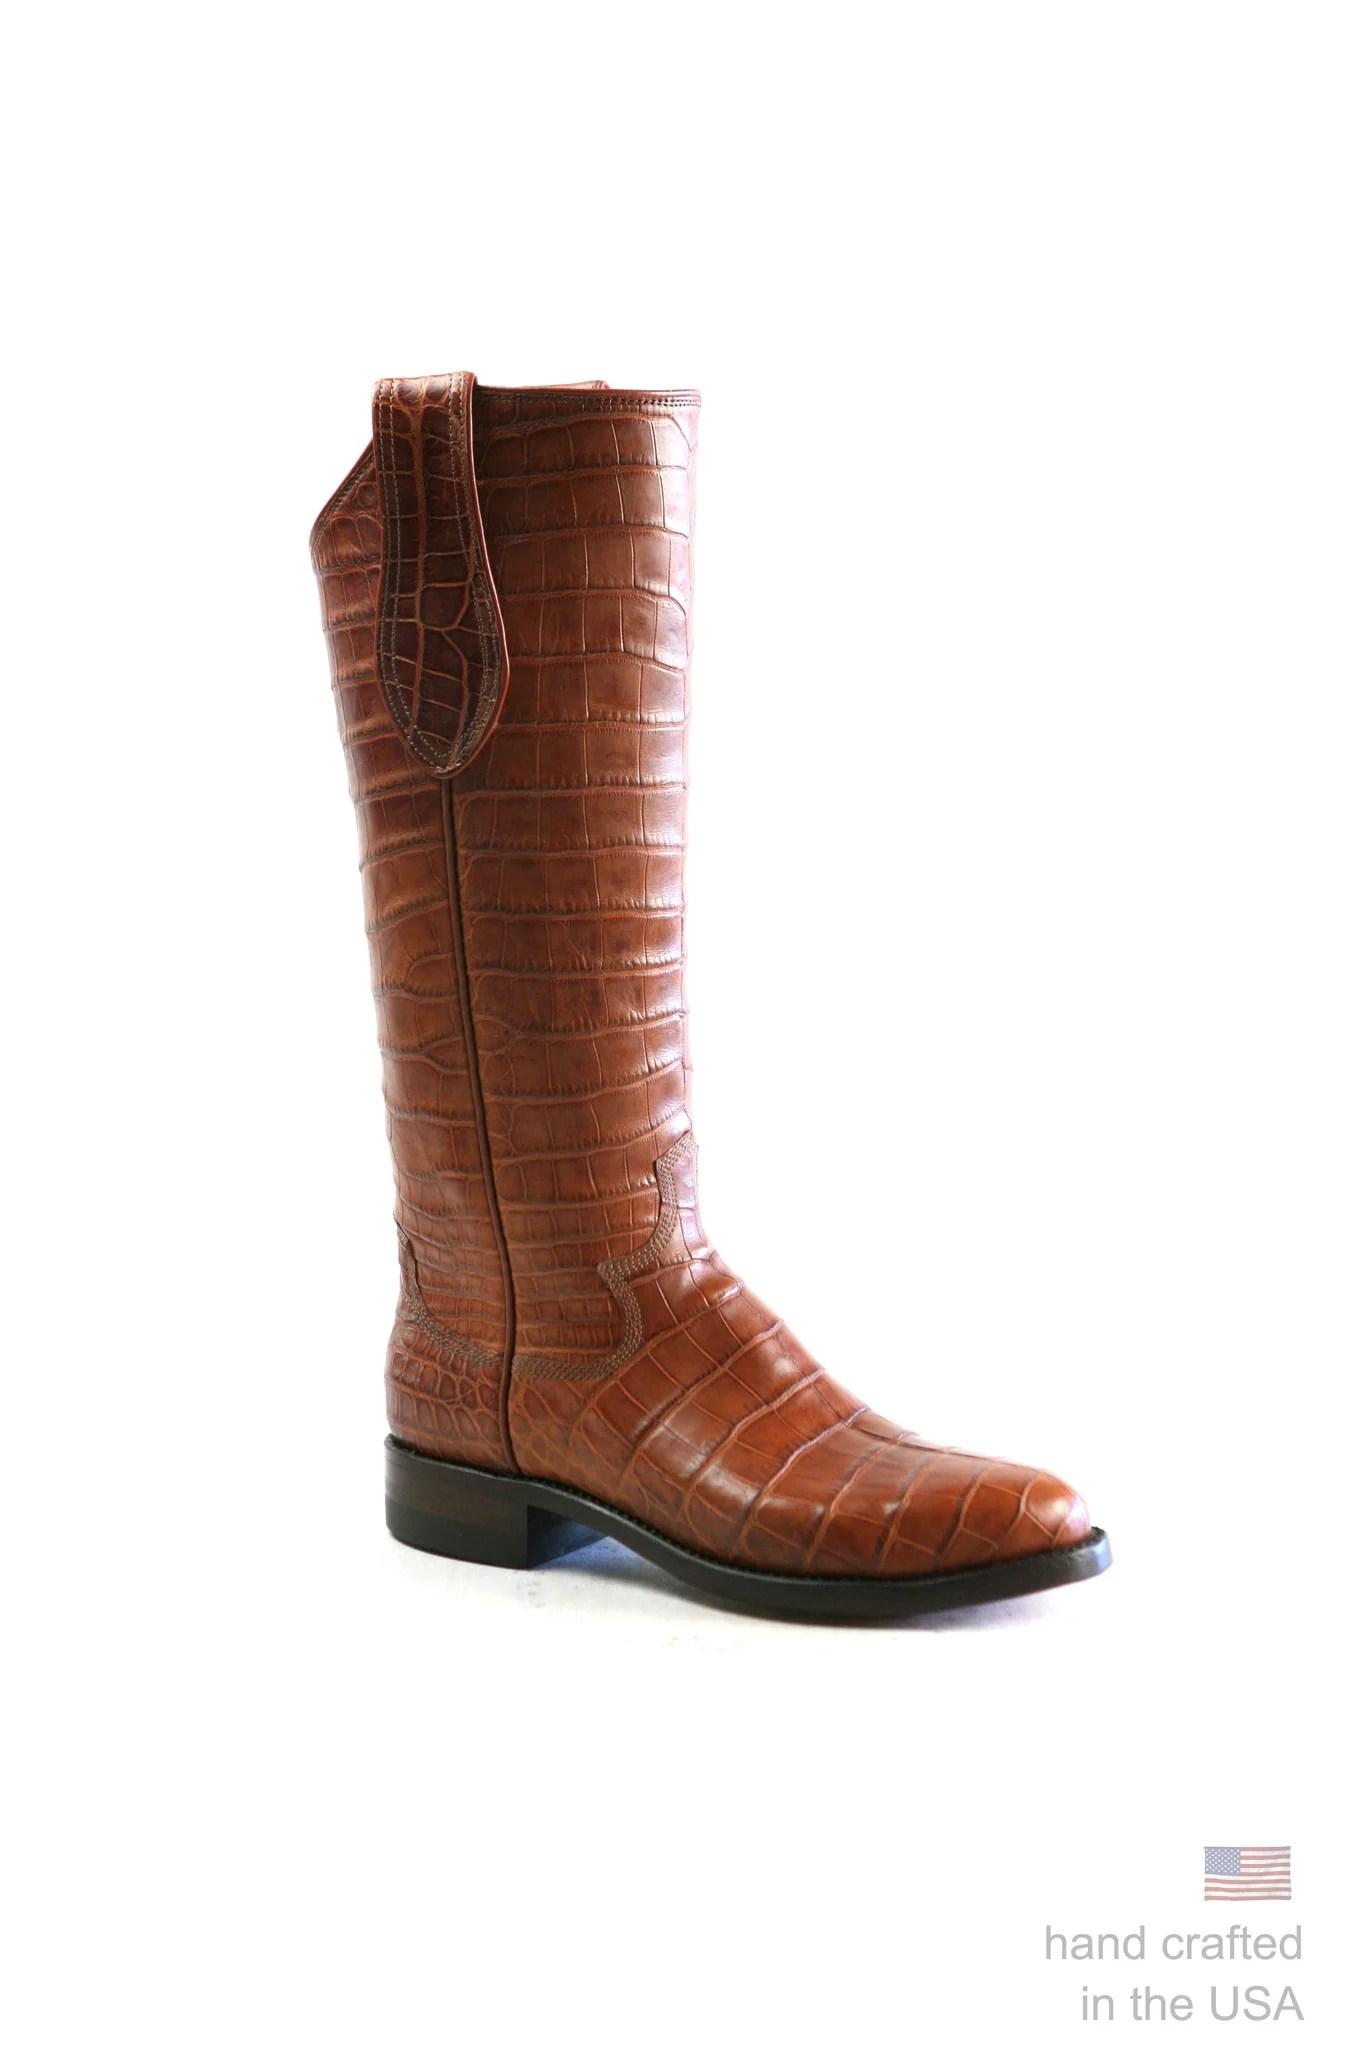 8a5b03b547a Custom Made Alligator Boots - Ivoiregion